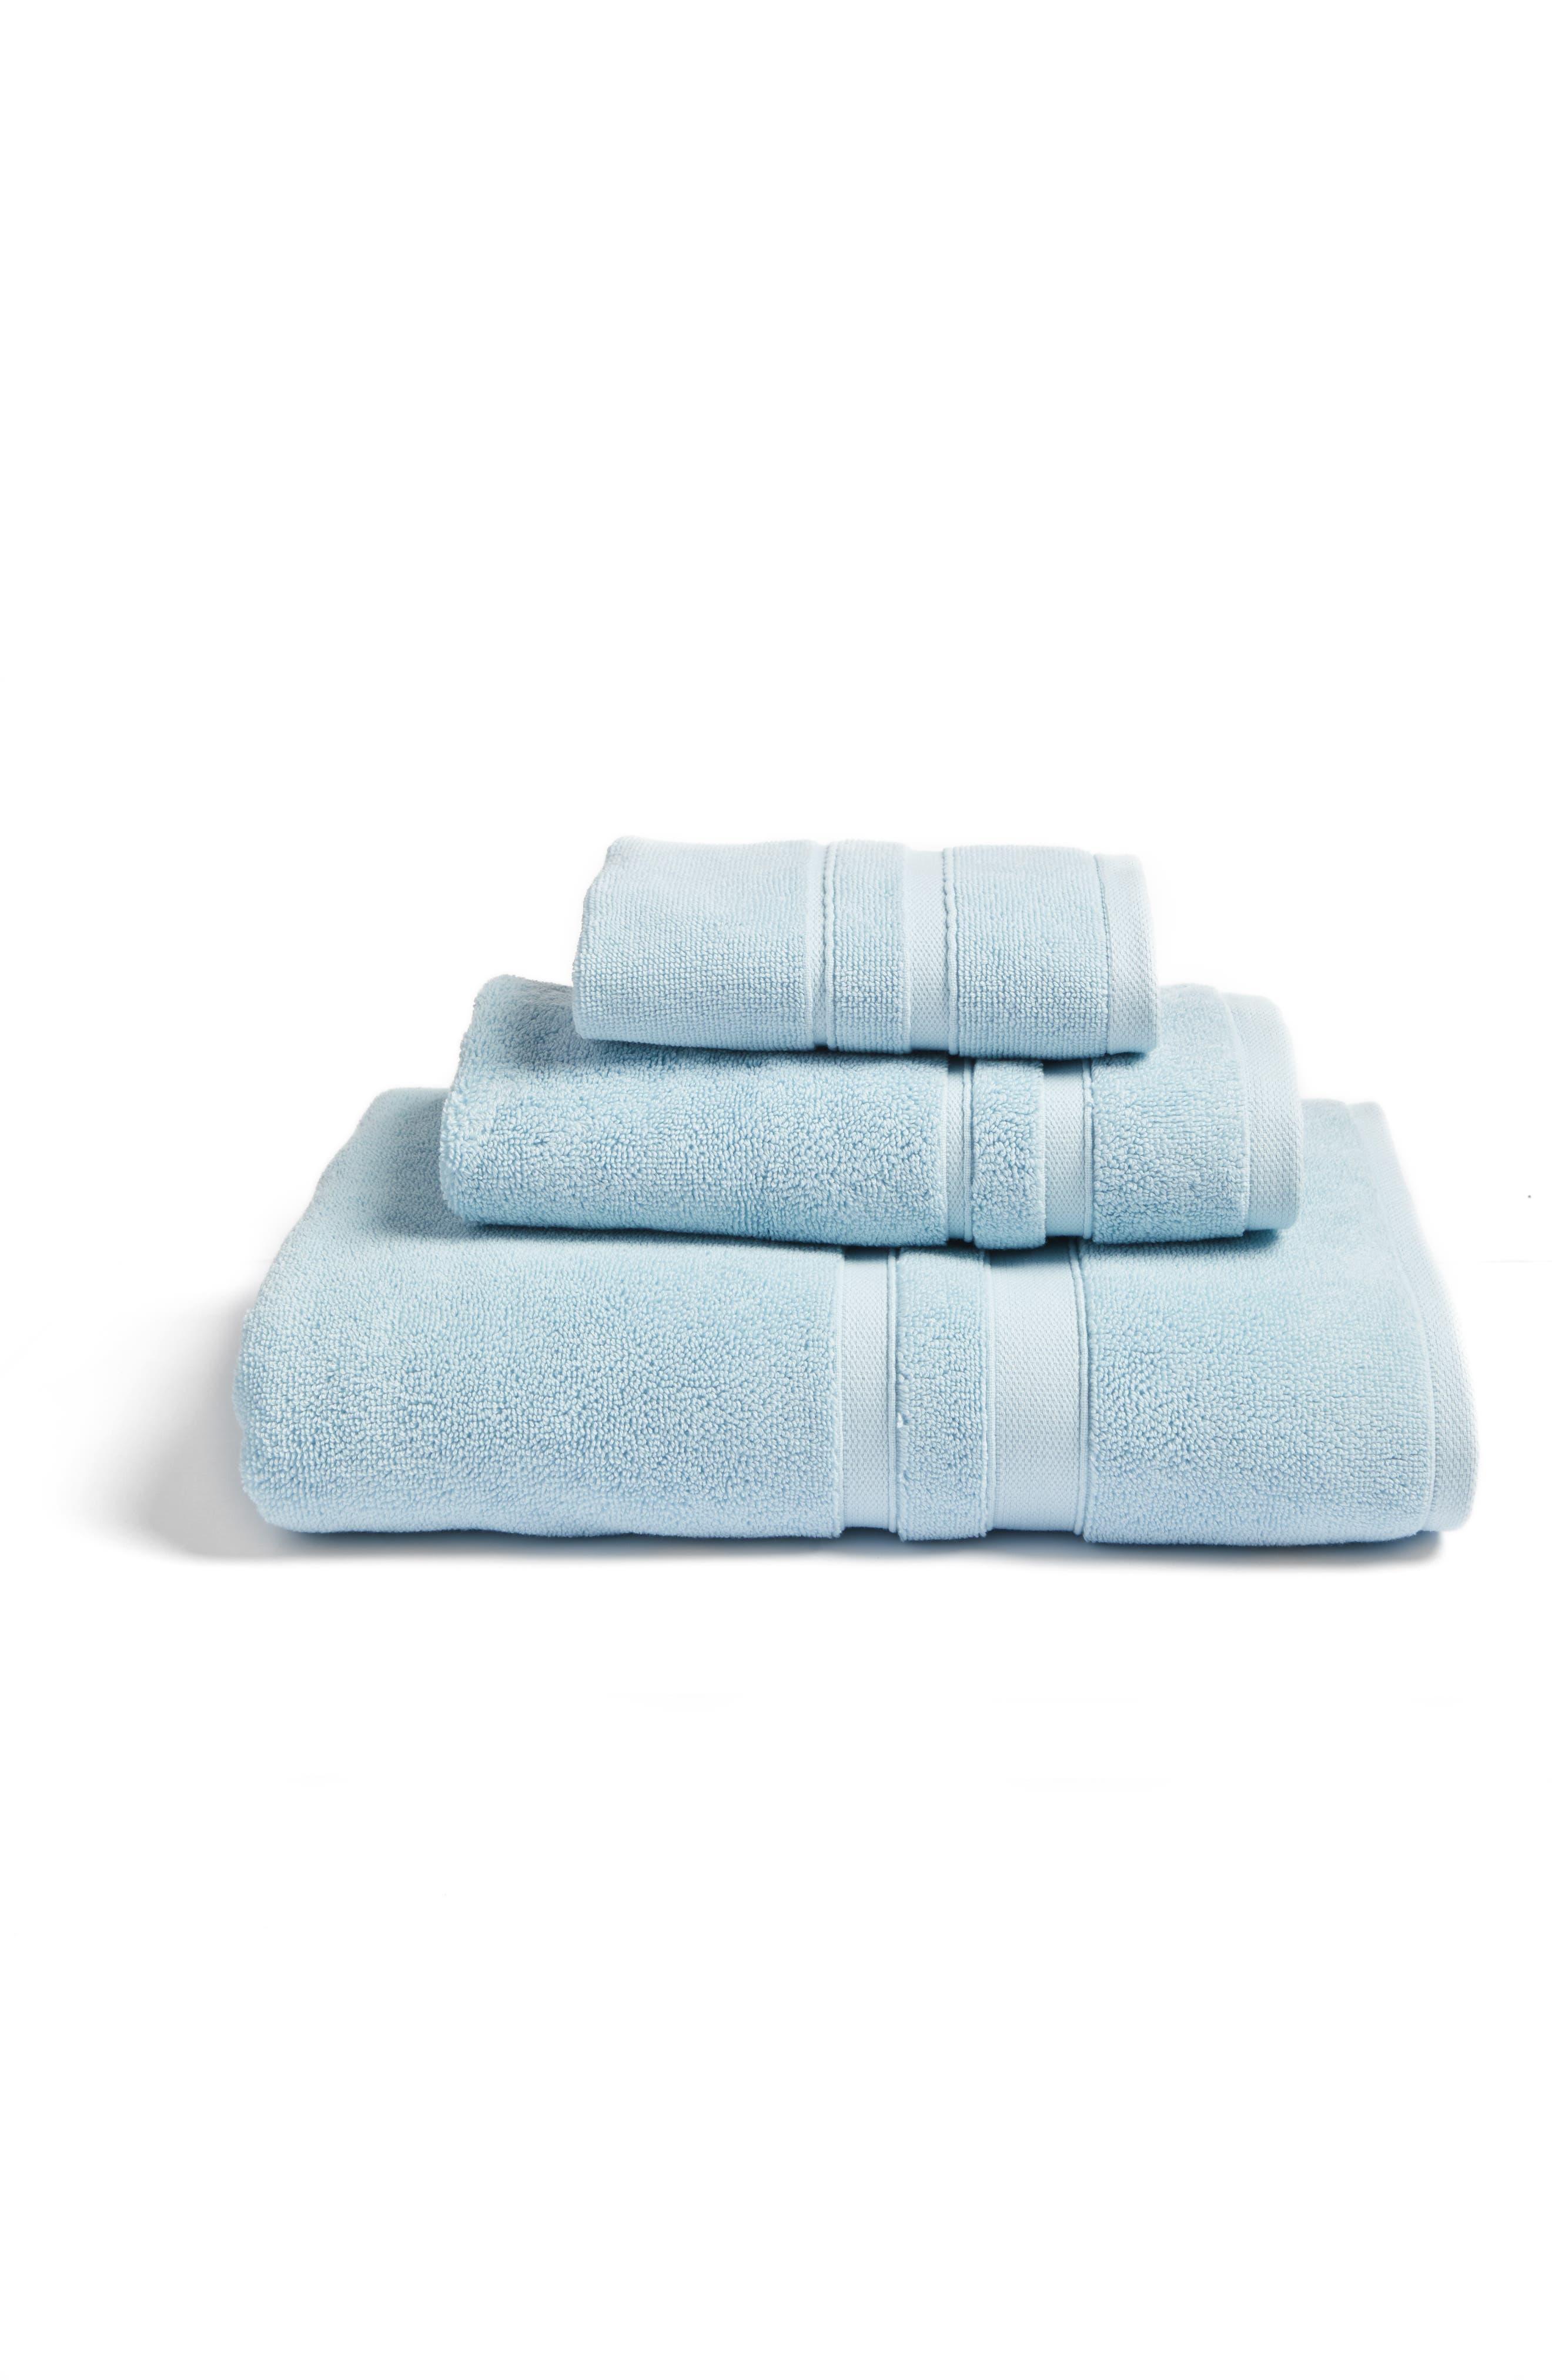 Studio 'Perennial' Combed Turkish Cotton Washcloth,                             Alternate thumbnail 3, color,                             Chrystal Blue